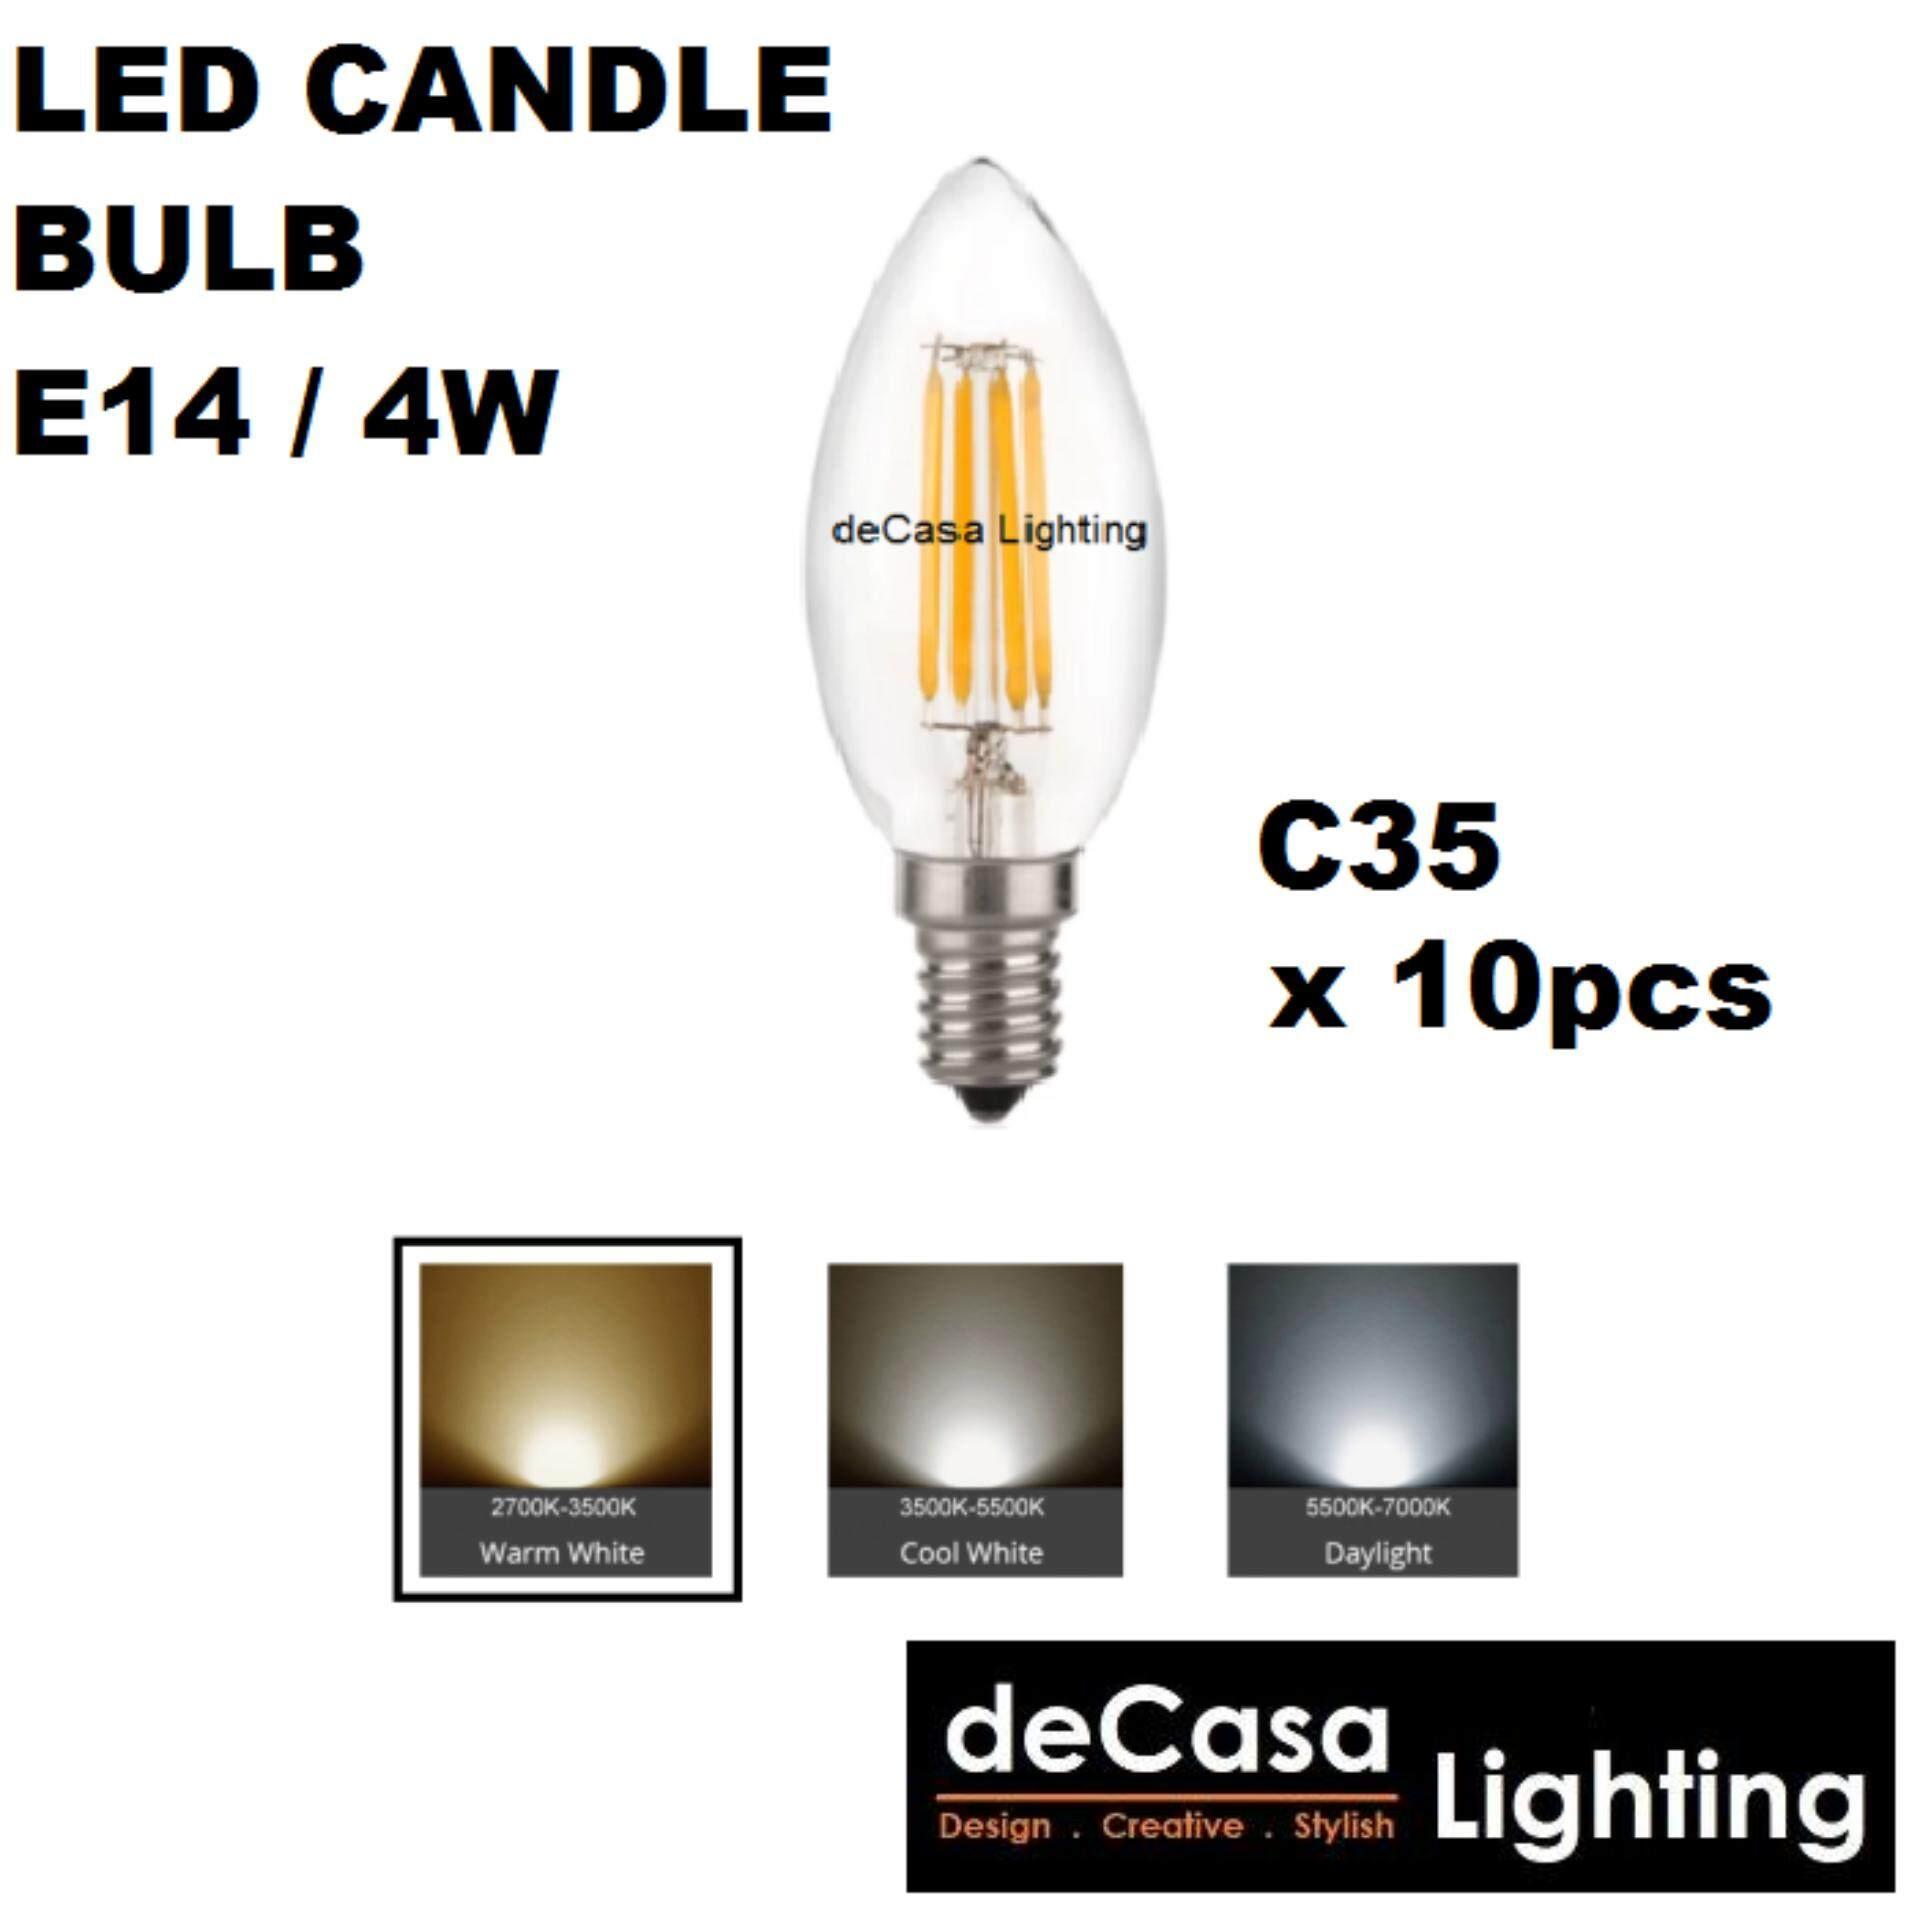 10pcs Led Candle Bulb E14 Lamp Holder Bulb 4w Led Filament Bulb Daylight/Warmwhite (LY-C35-E14-4W)